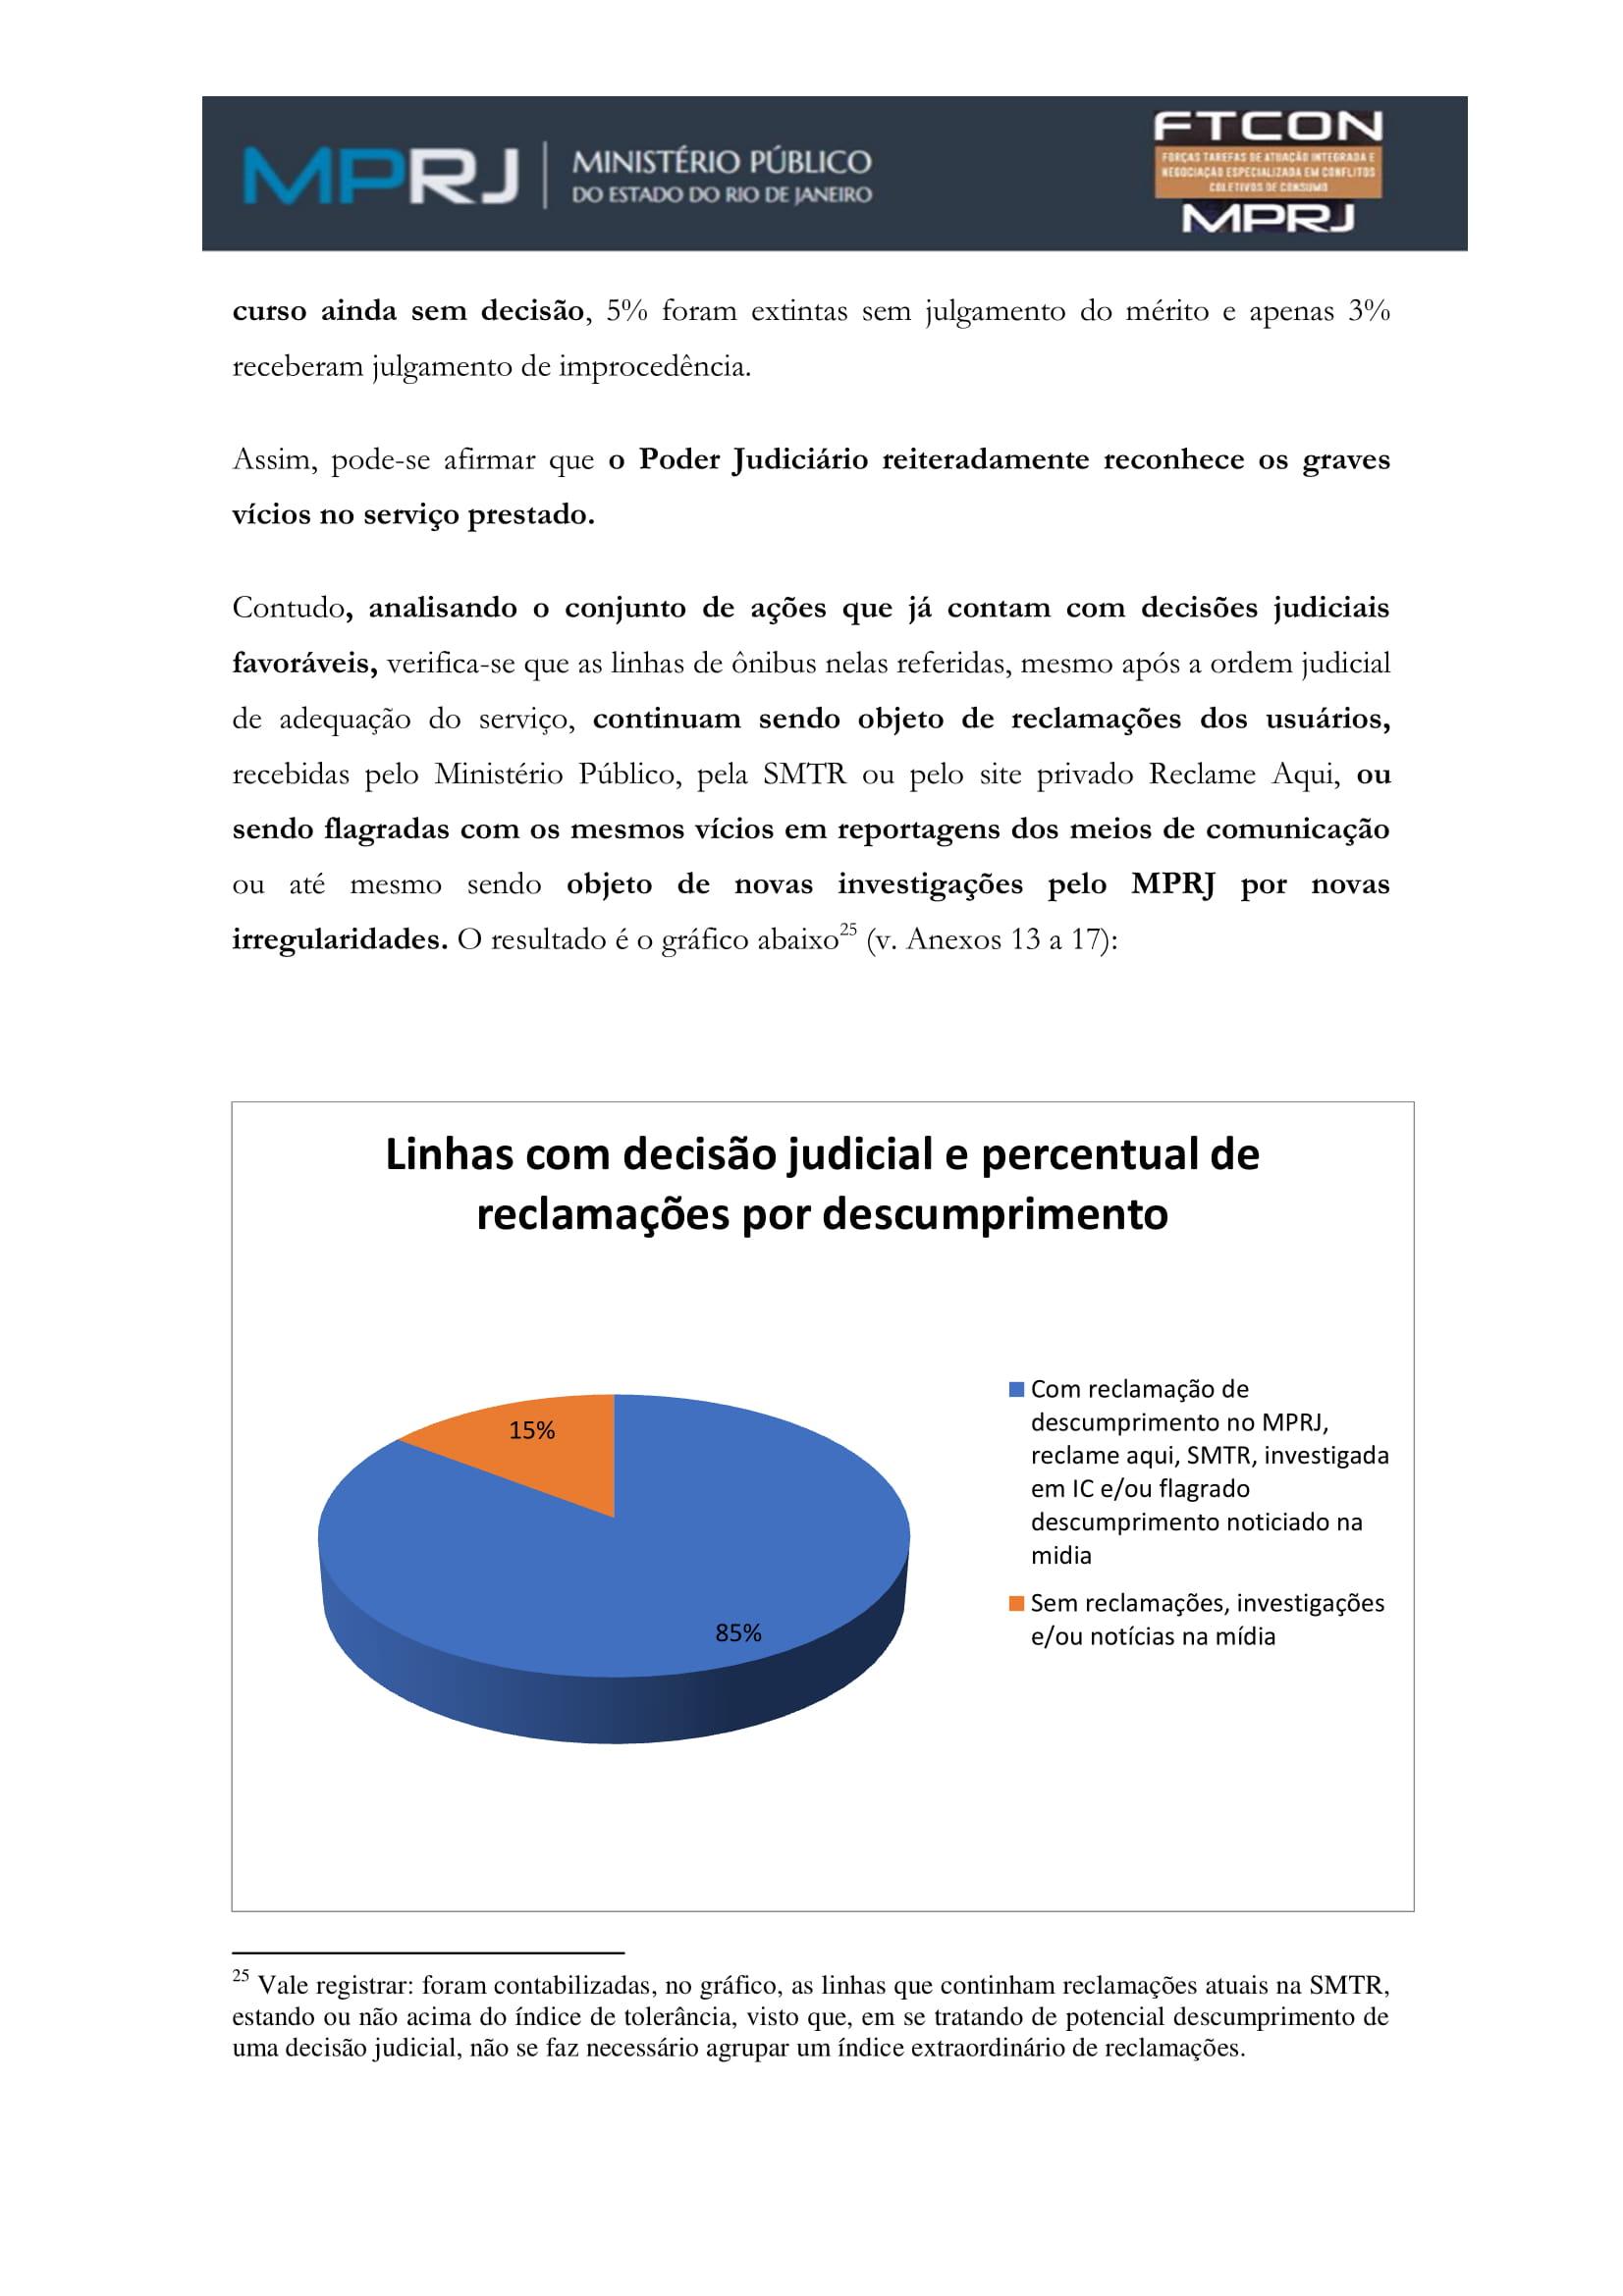 acp_caducidade_onibus_dr_rt-026